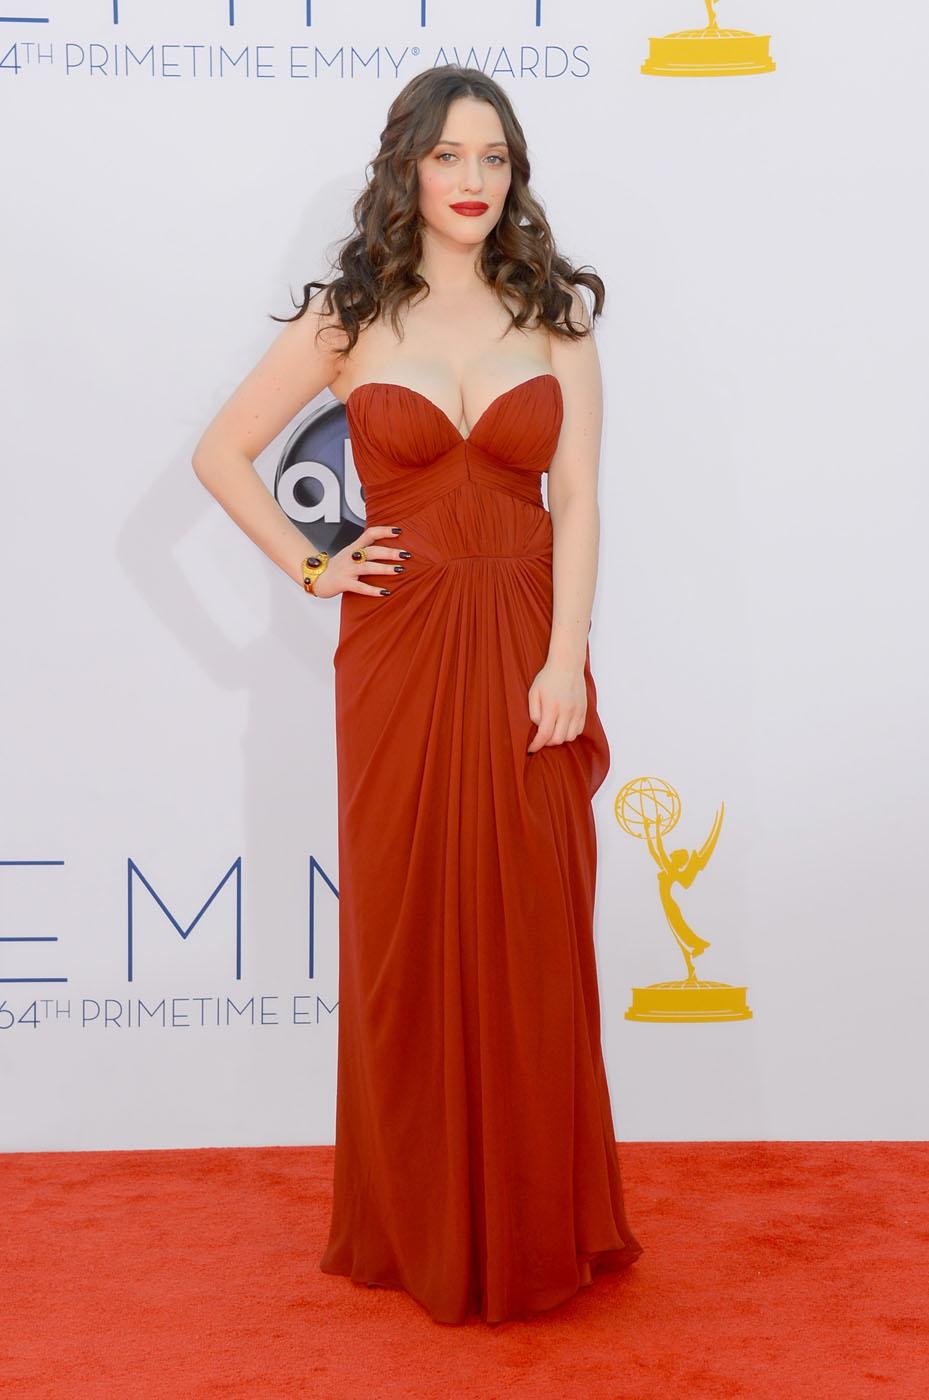 Kat Dennings  - 2012 Emmy Awards, Red Carpet Looks